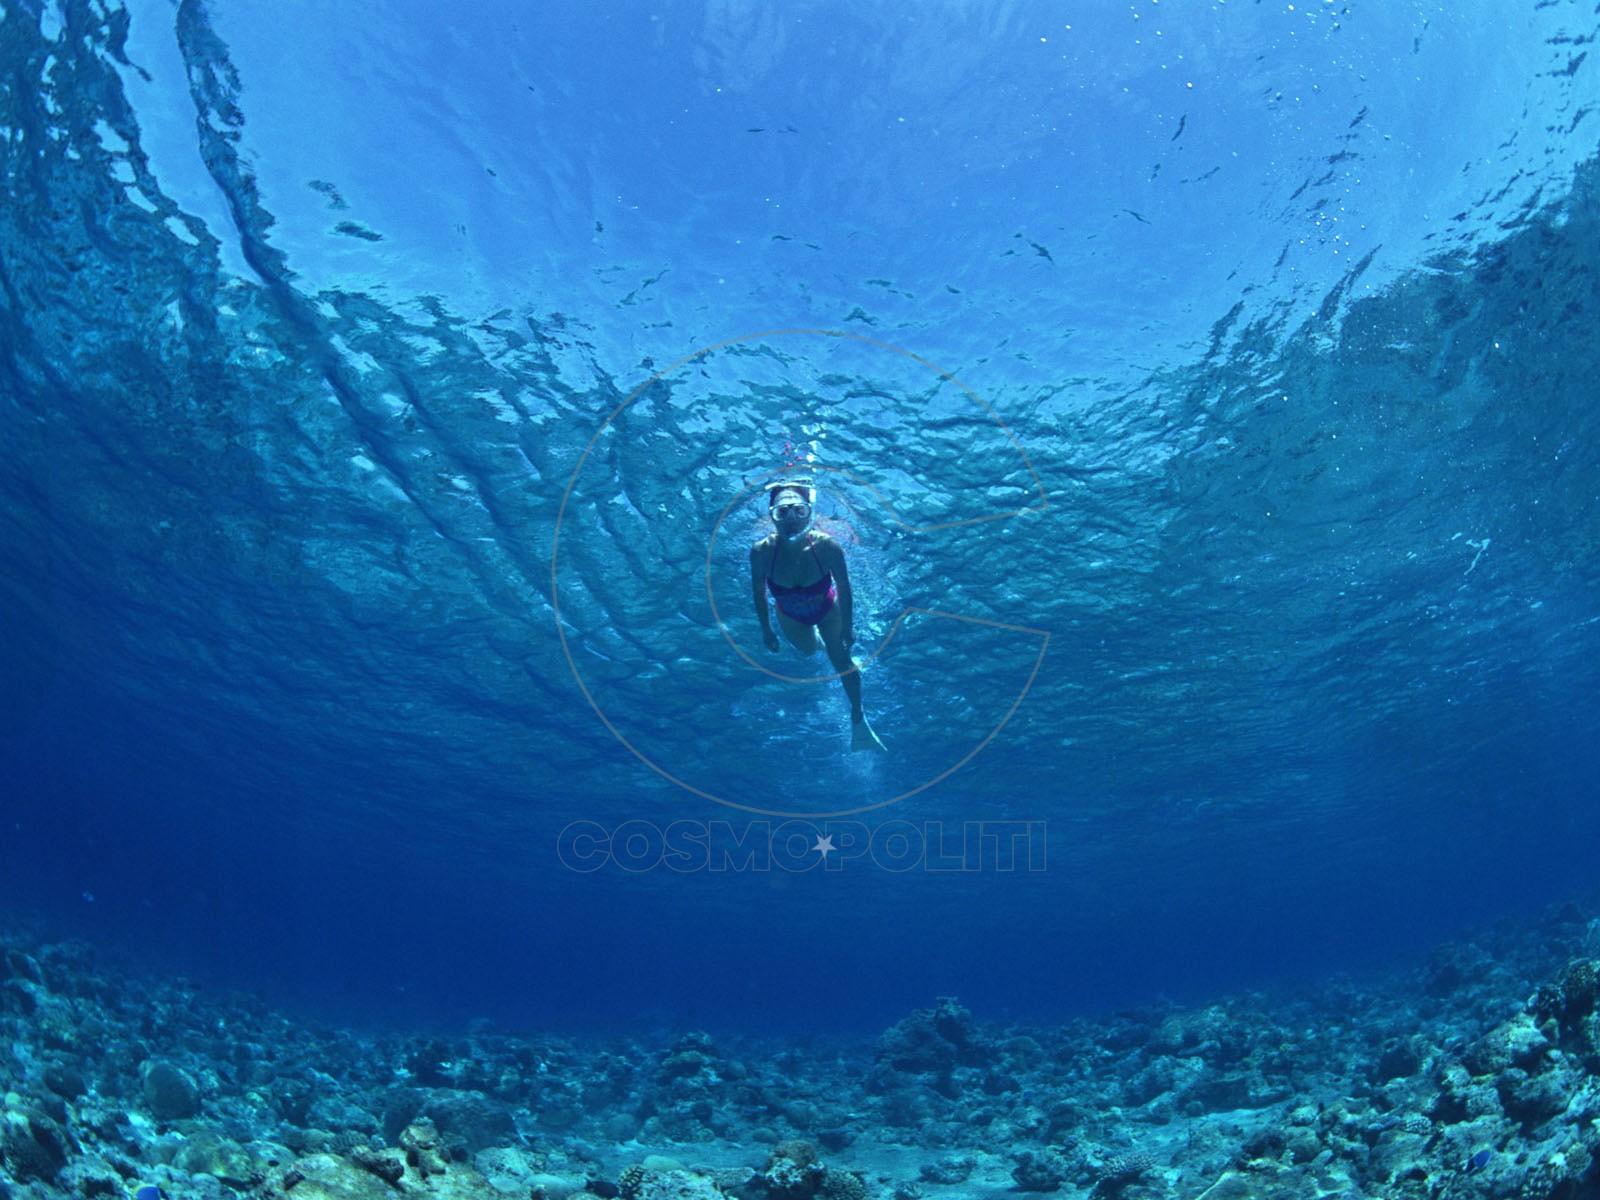 Swimming-in-the-sea14